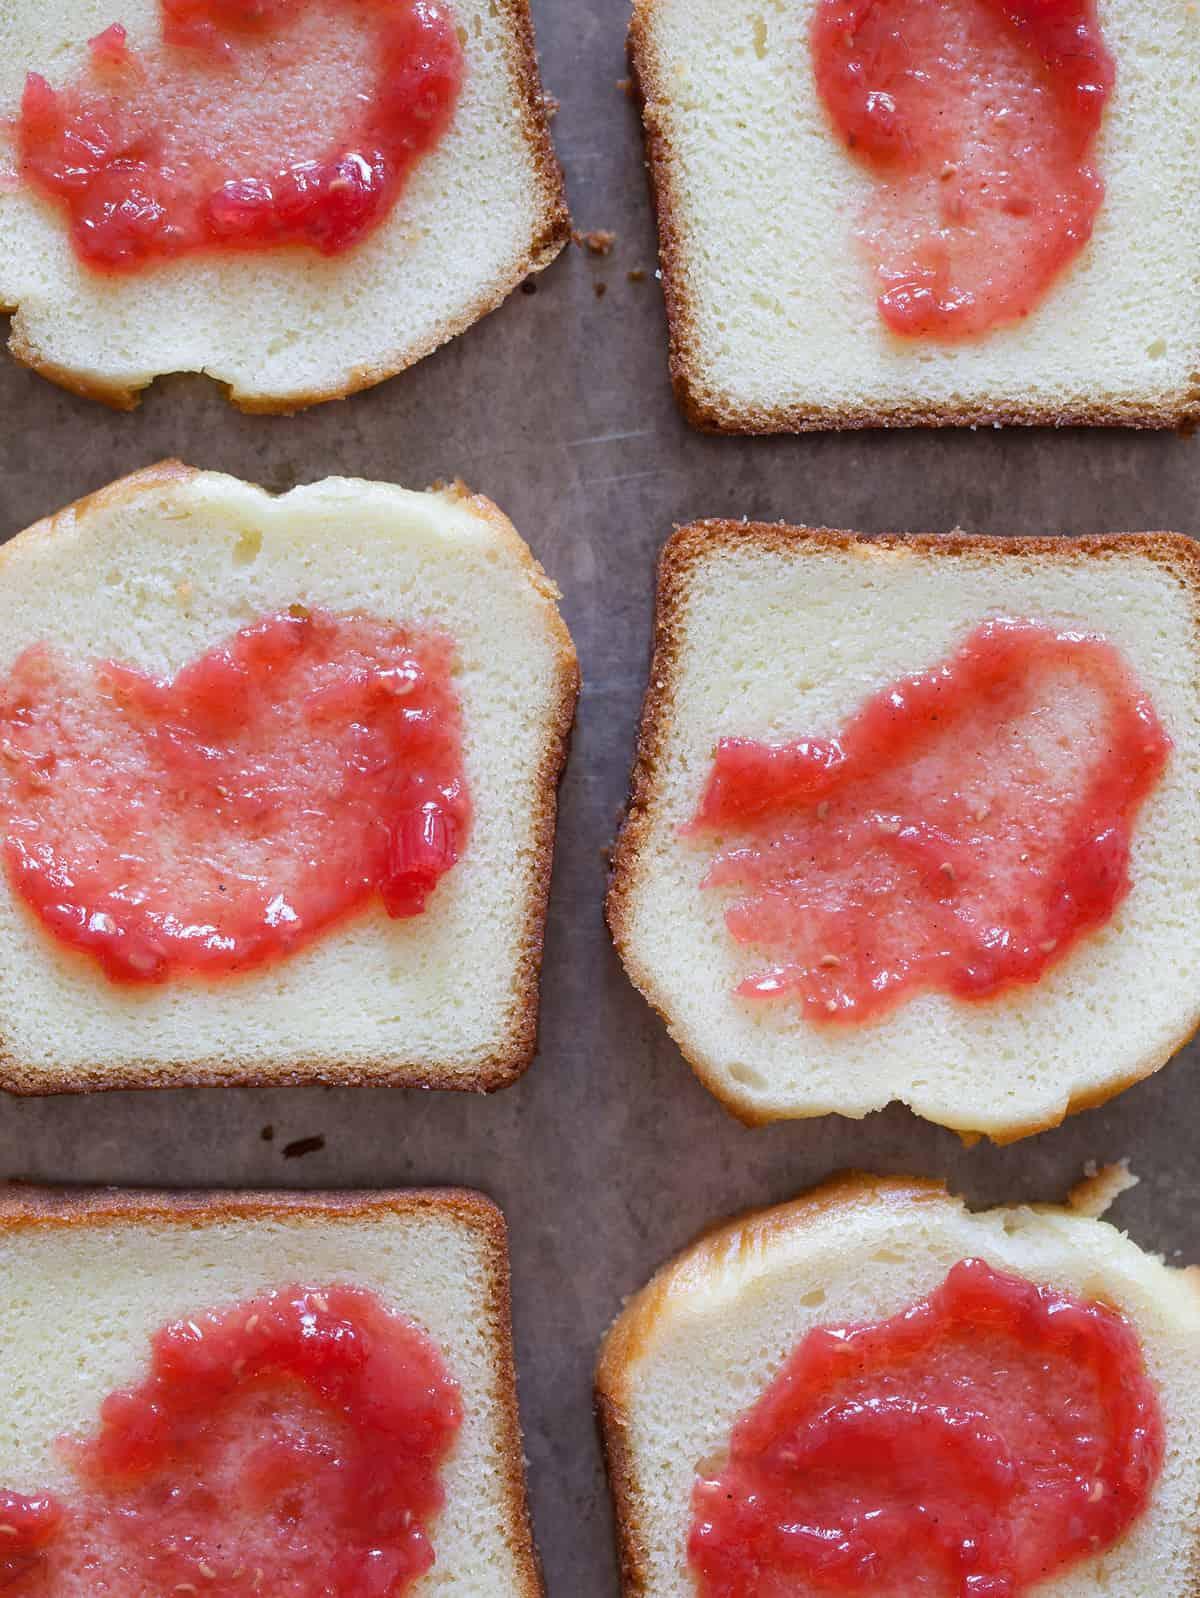 A recipe for Rhubarb Raspberry and Cardamom Jam.